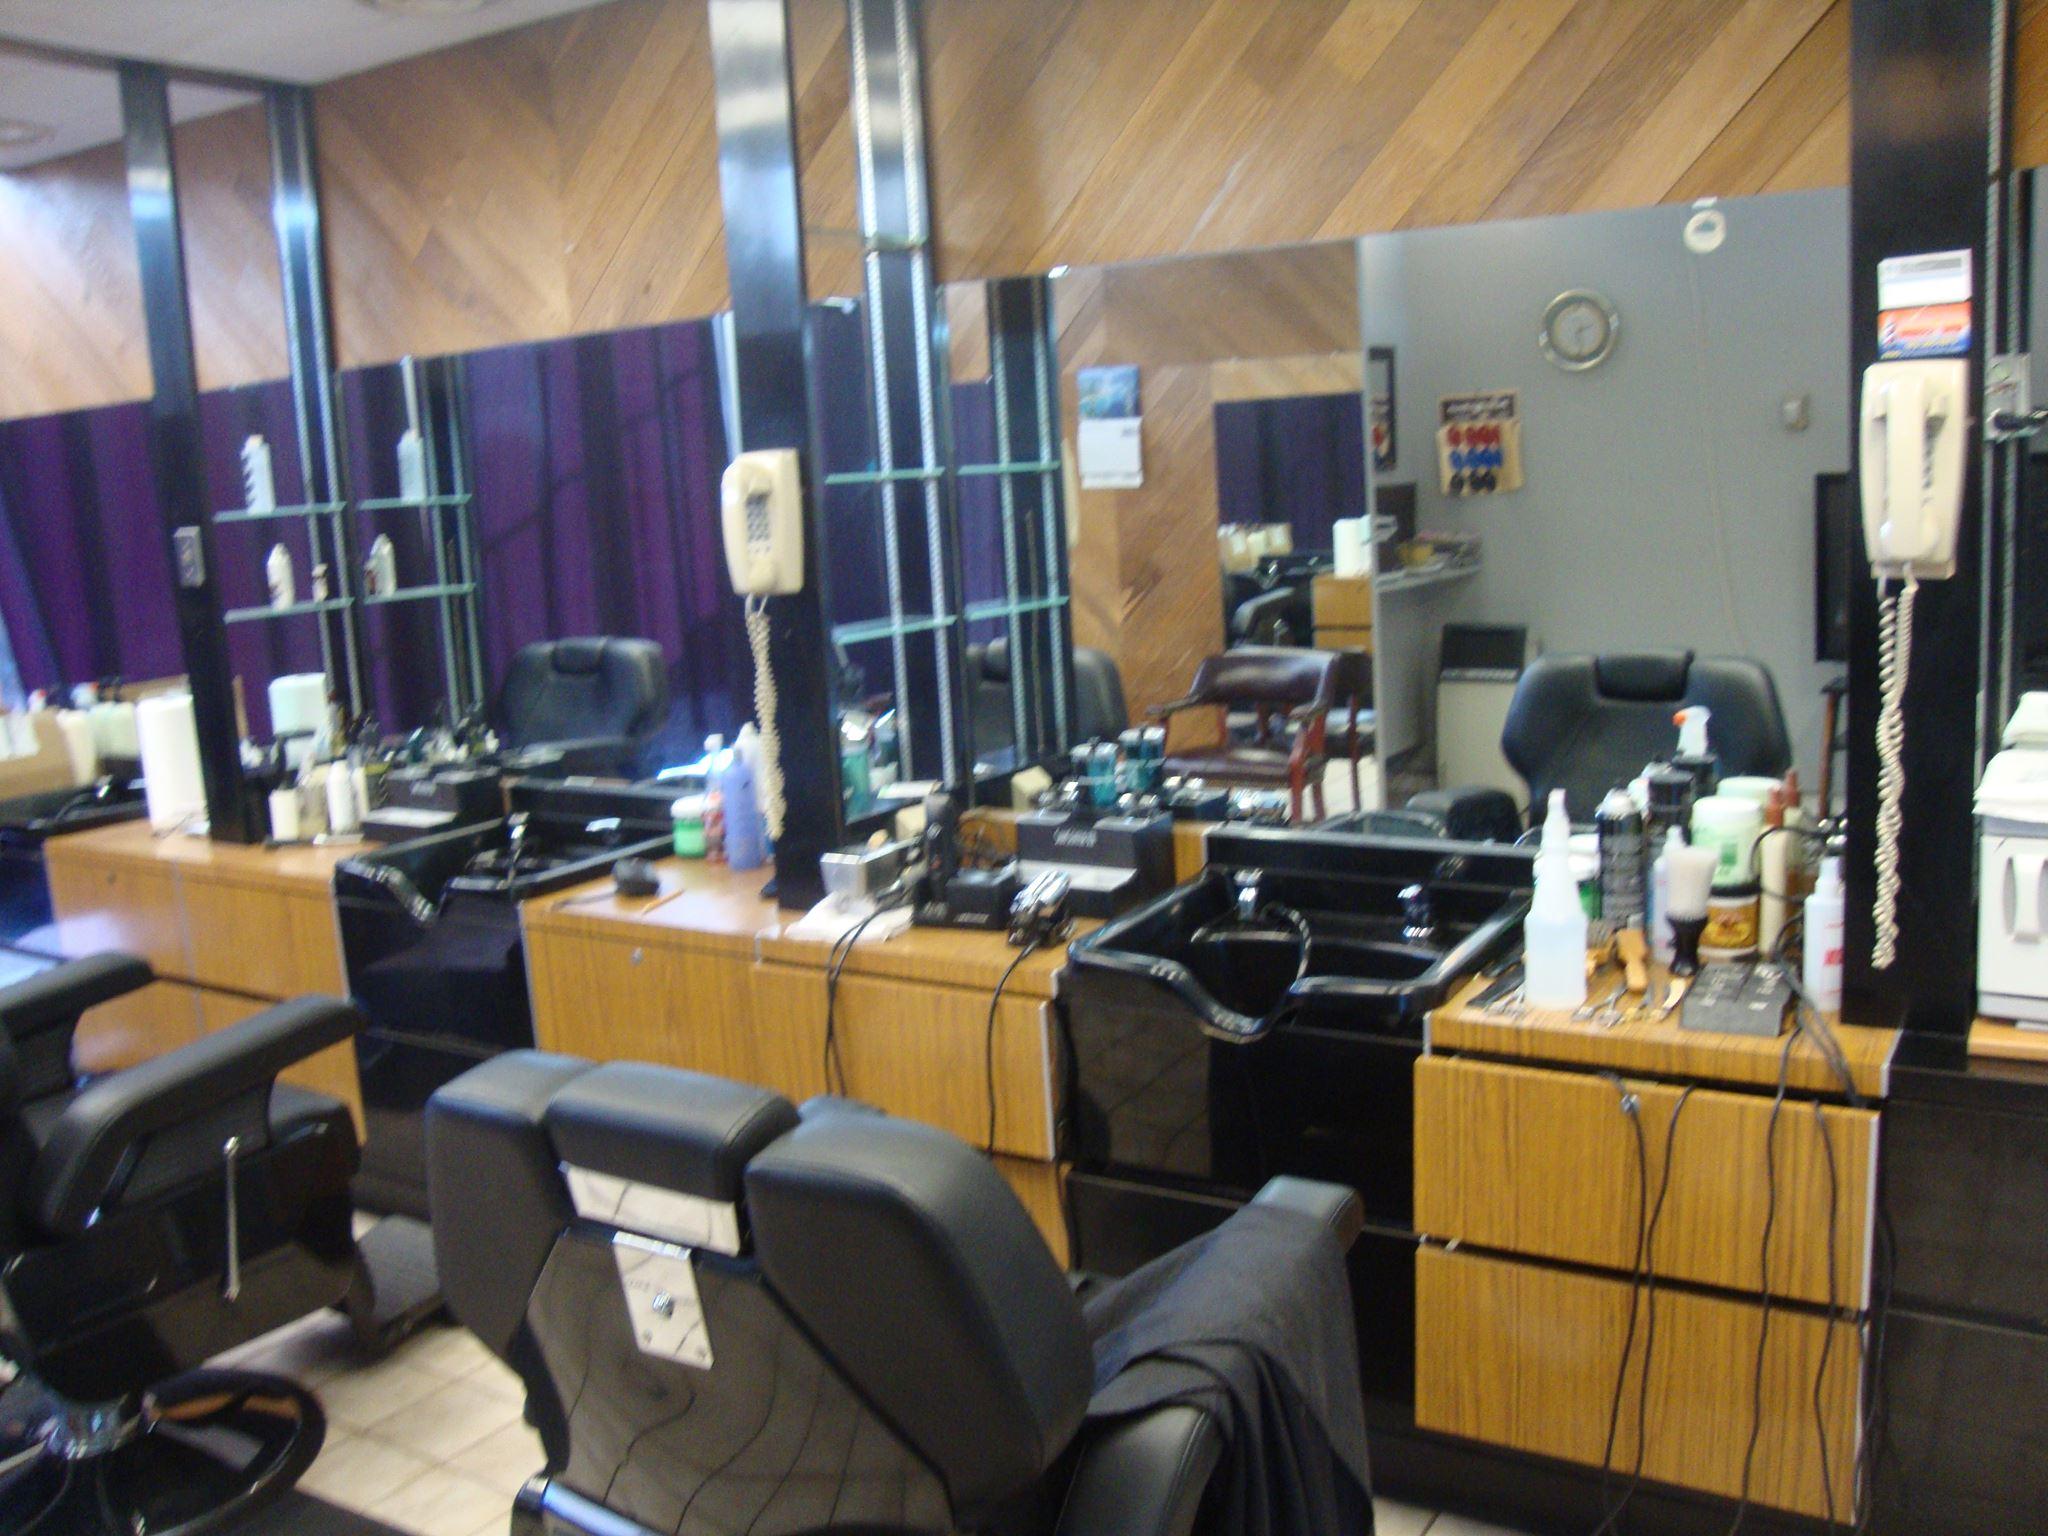 Arizona's Top Rated Local® Barber Shops Award Winner: Executive Towers Barber Salon